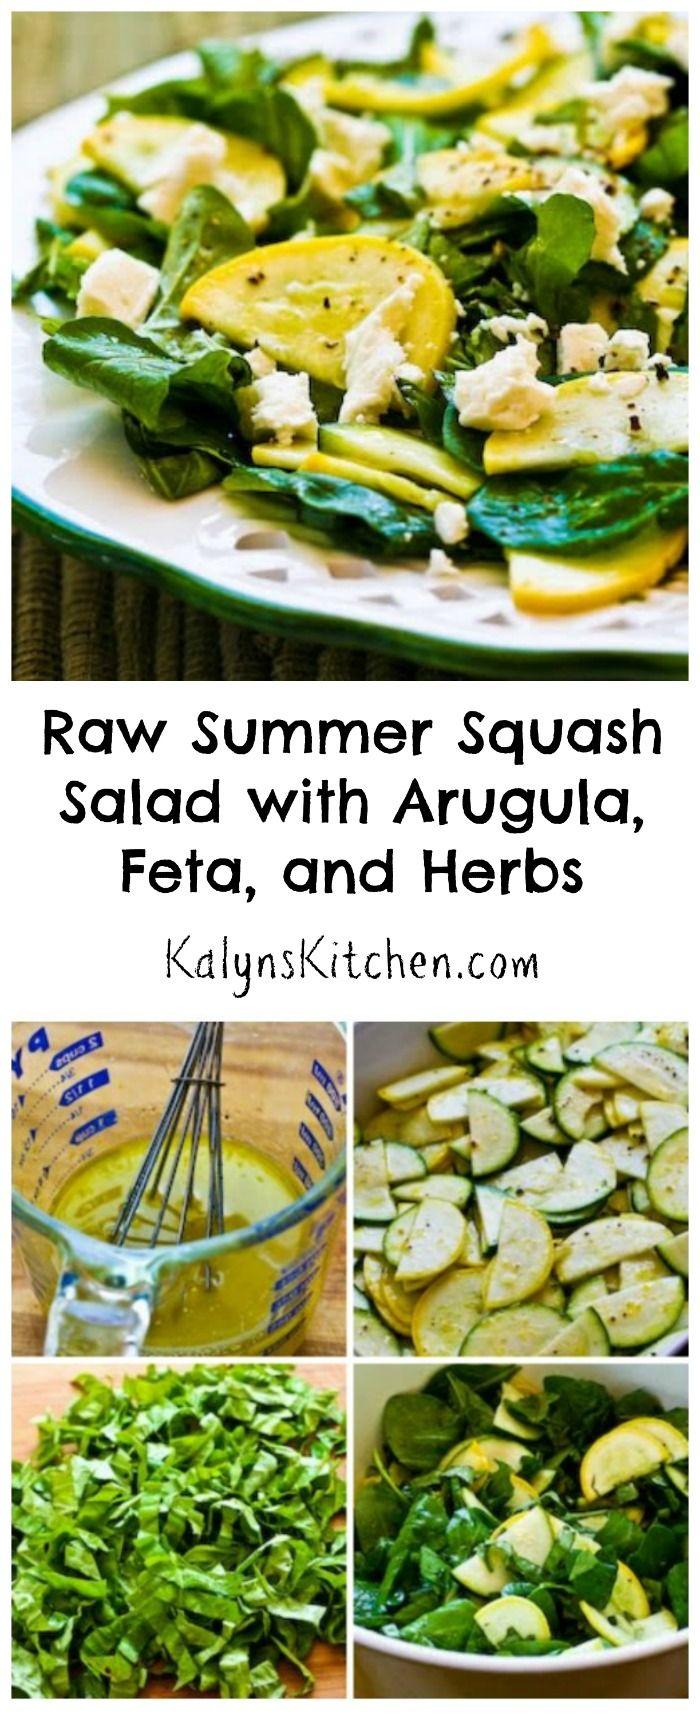 Raw Summer Squash Salad with Arugula, Feta, and Herbs ...